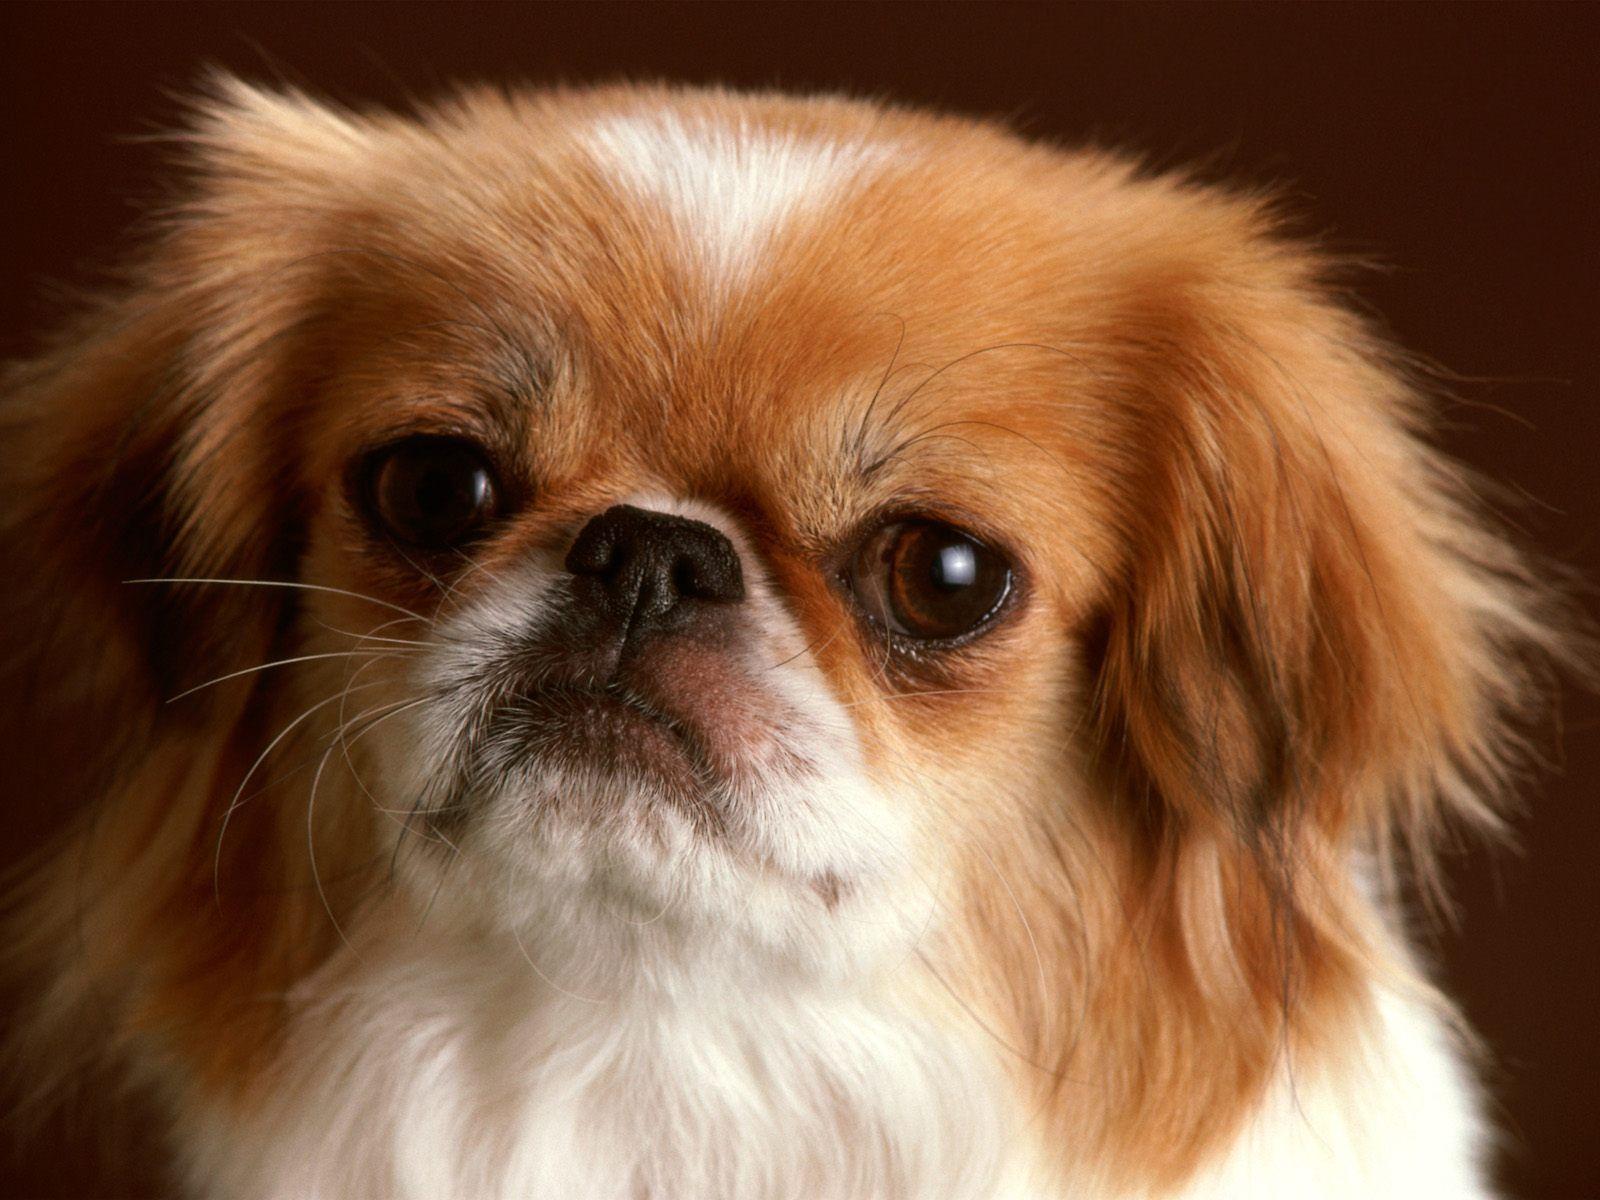 Cute Dogs   Dogs Wallpaper 13882990 1600x1200